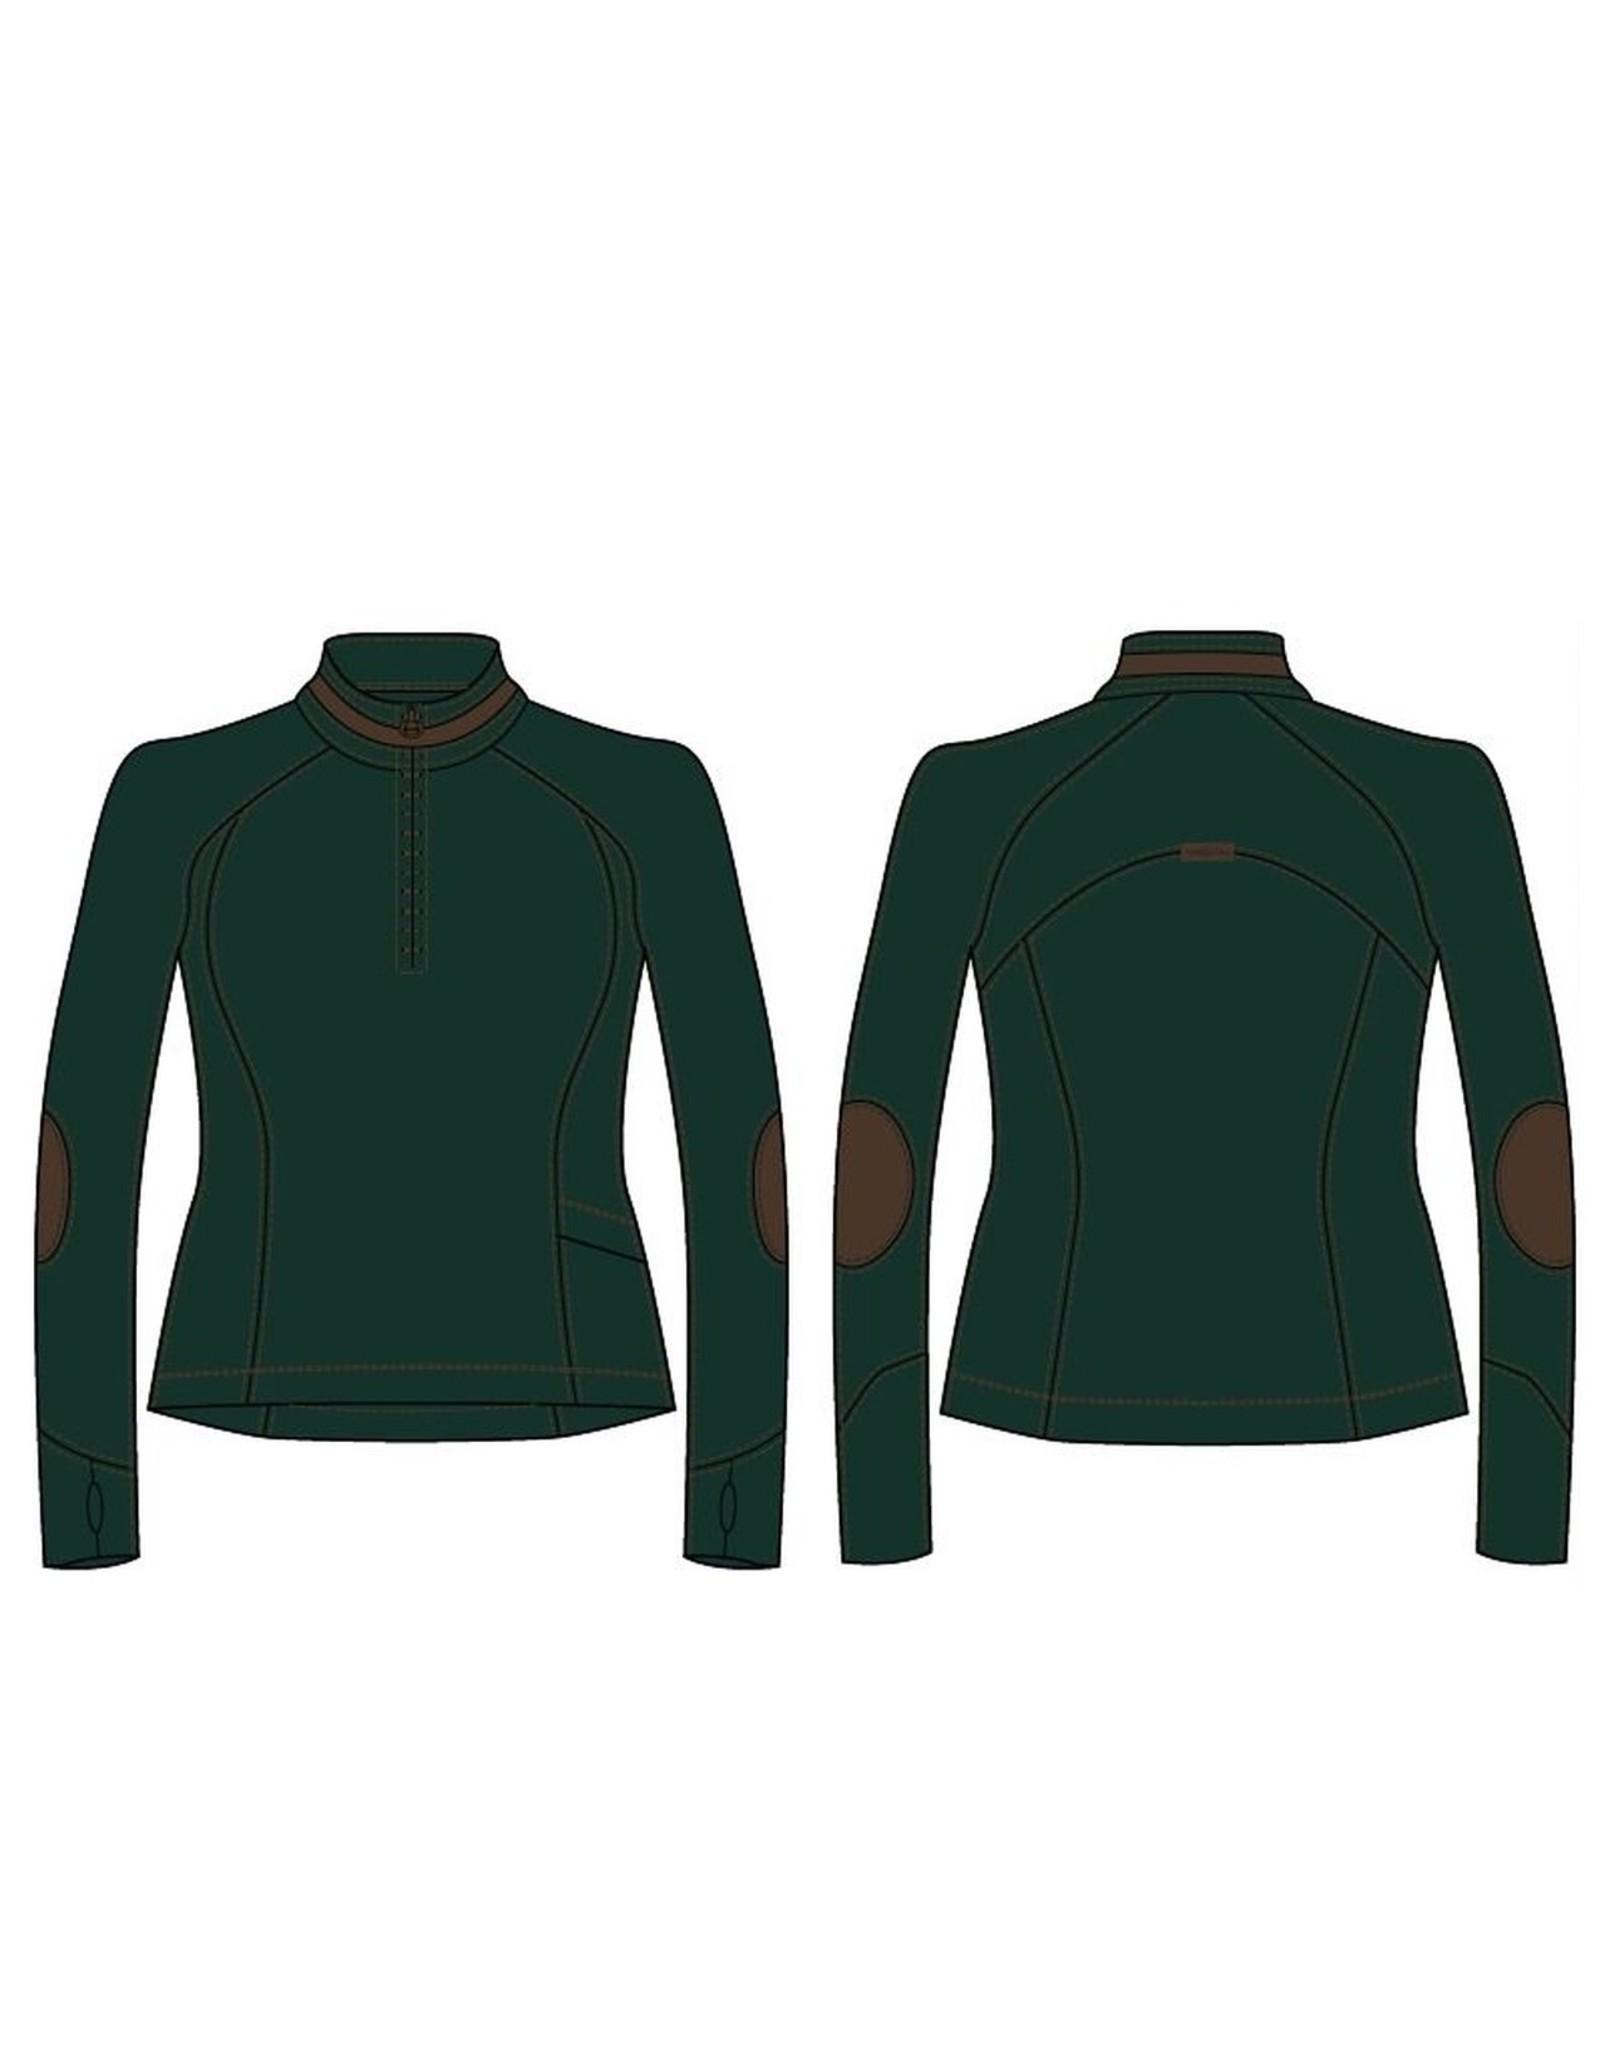 Chestnut Bay Trailblazer Pullover